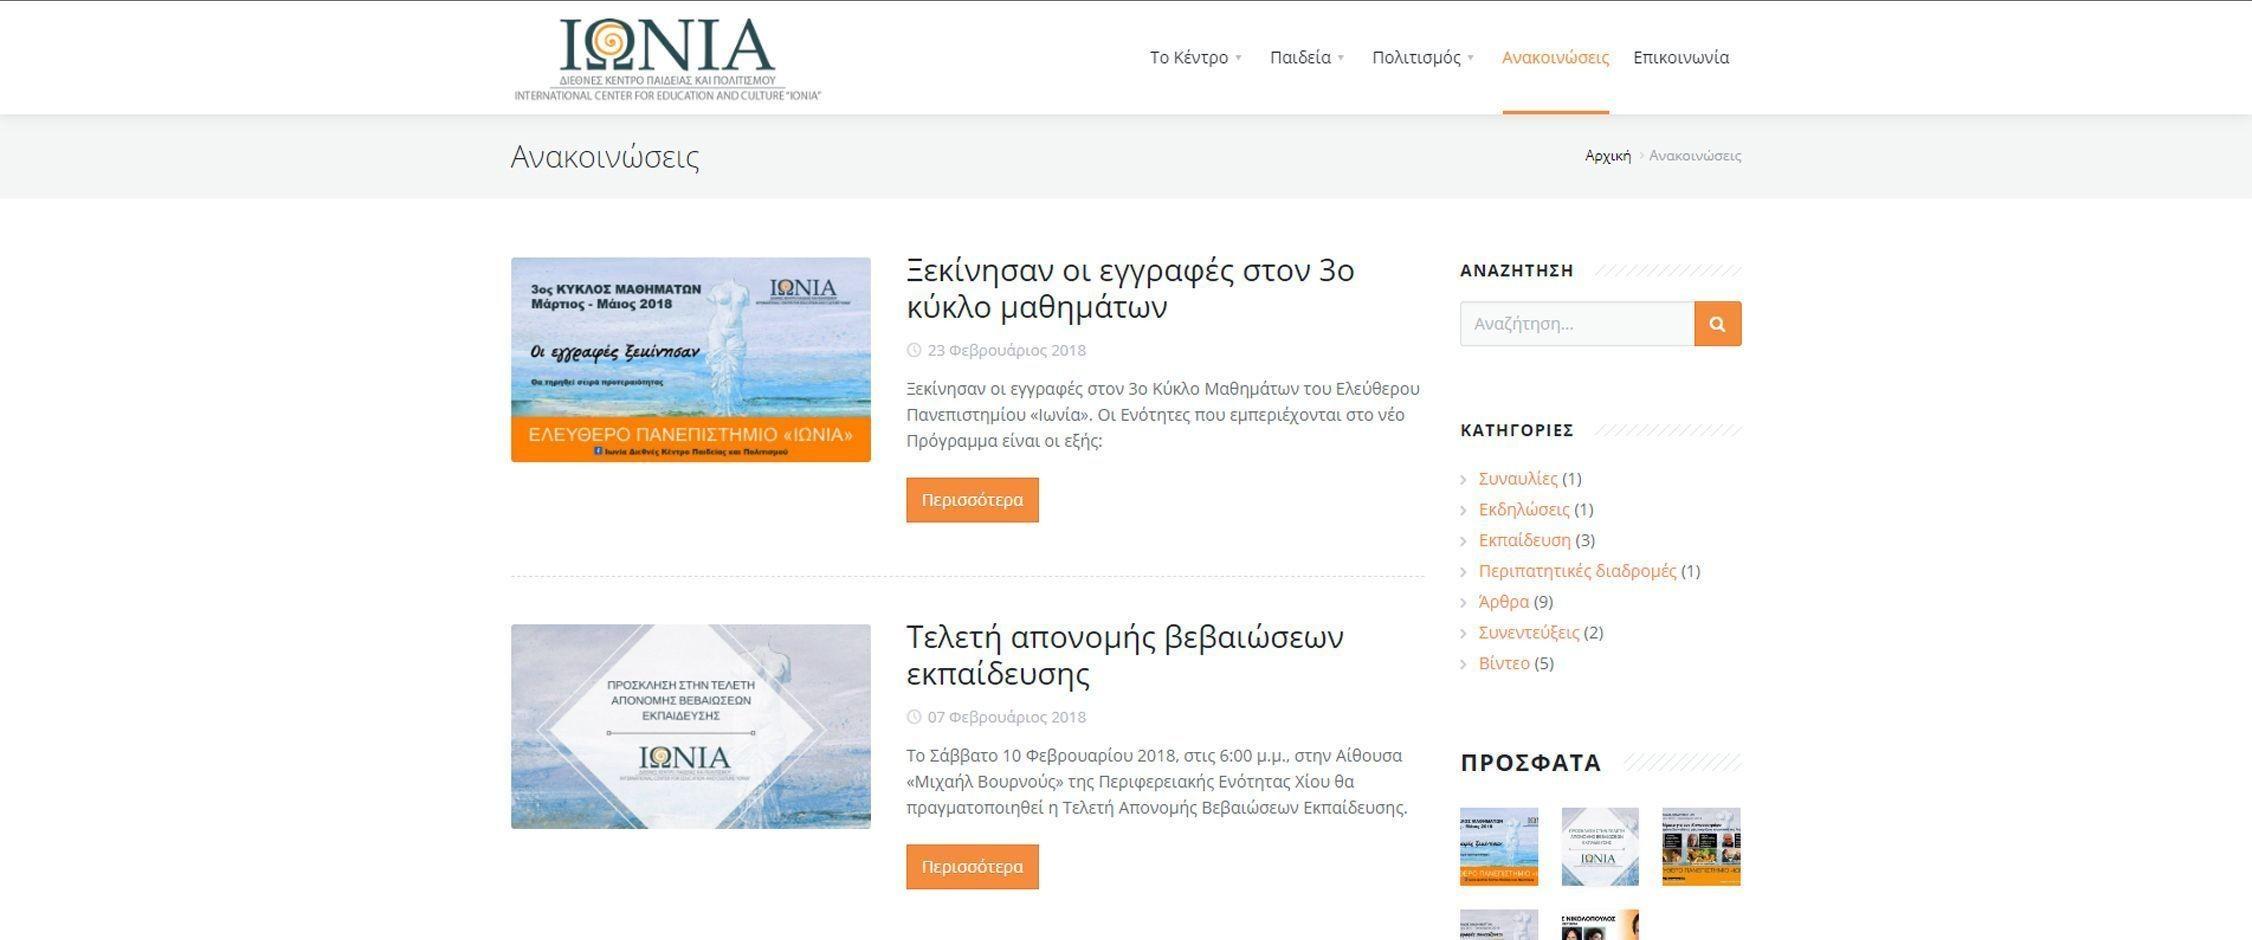 ionia-culture TruthWebMedia project